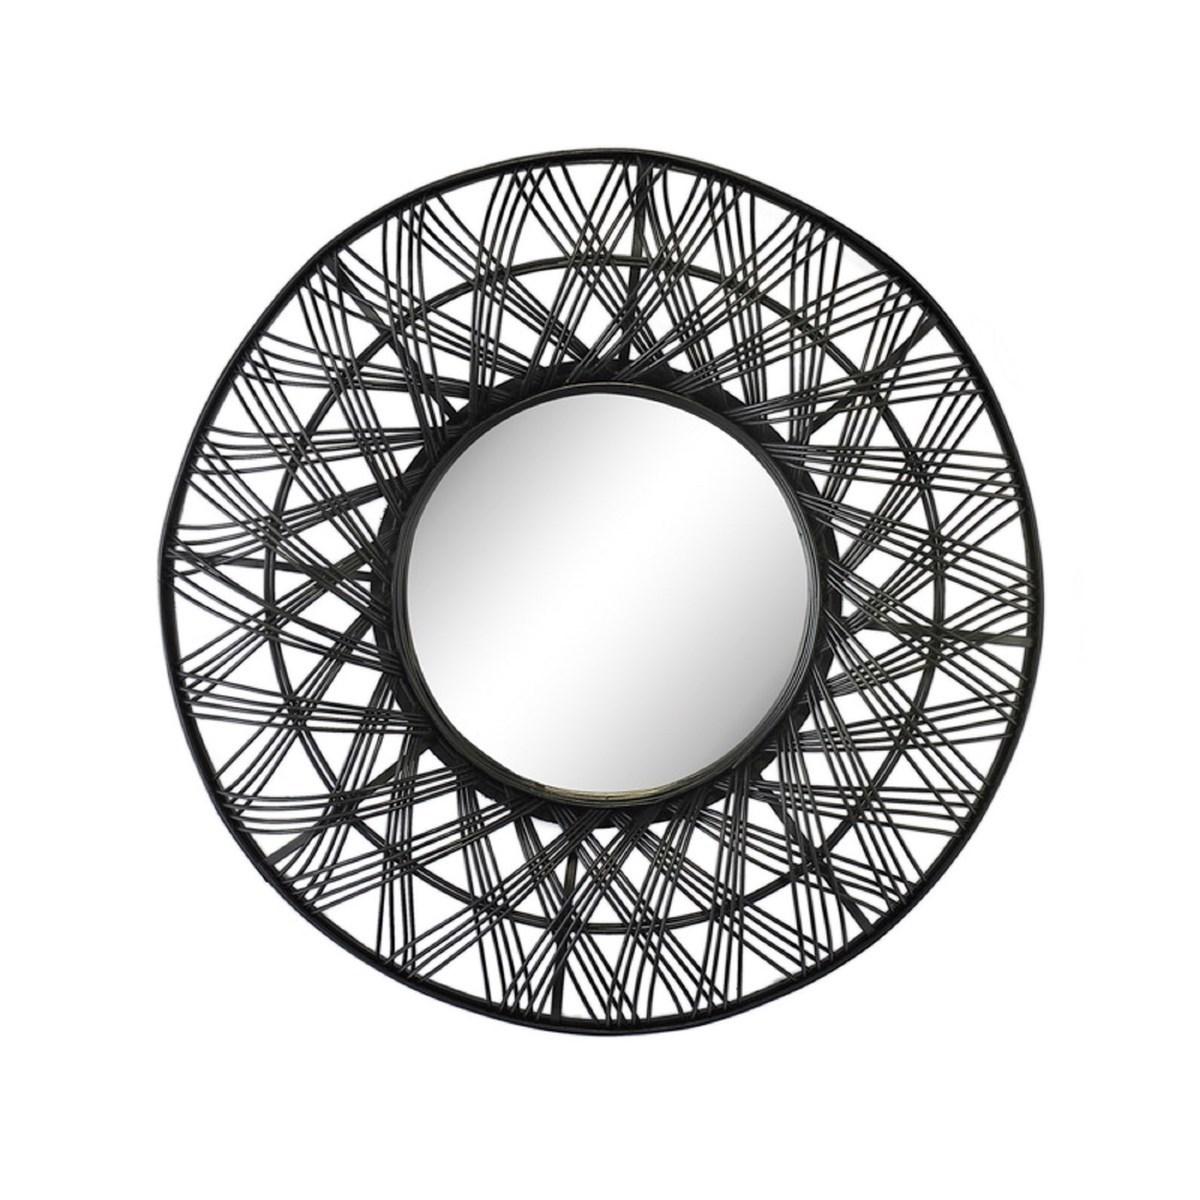 Miroir rond ethnique en Rotin Noir